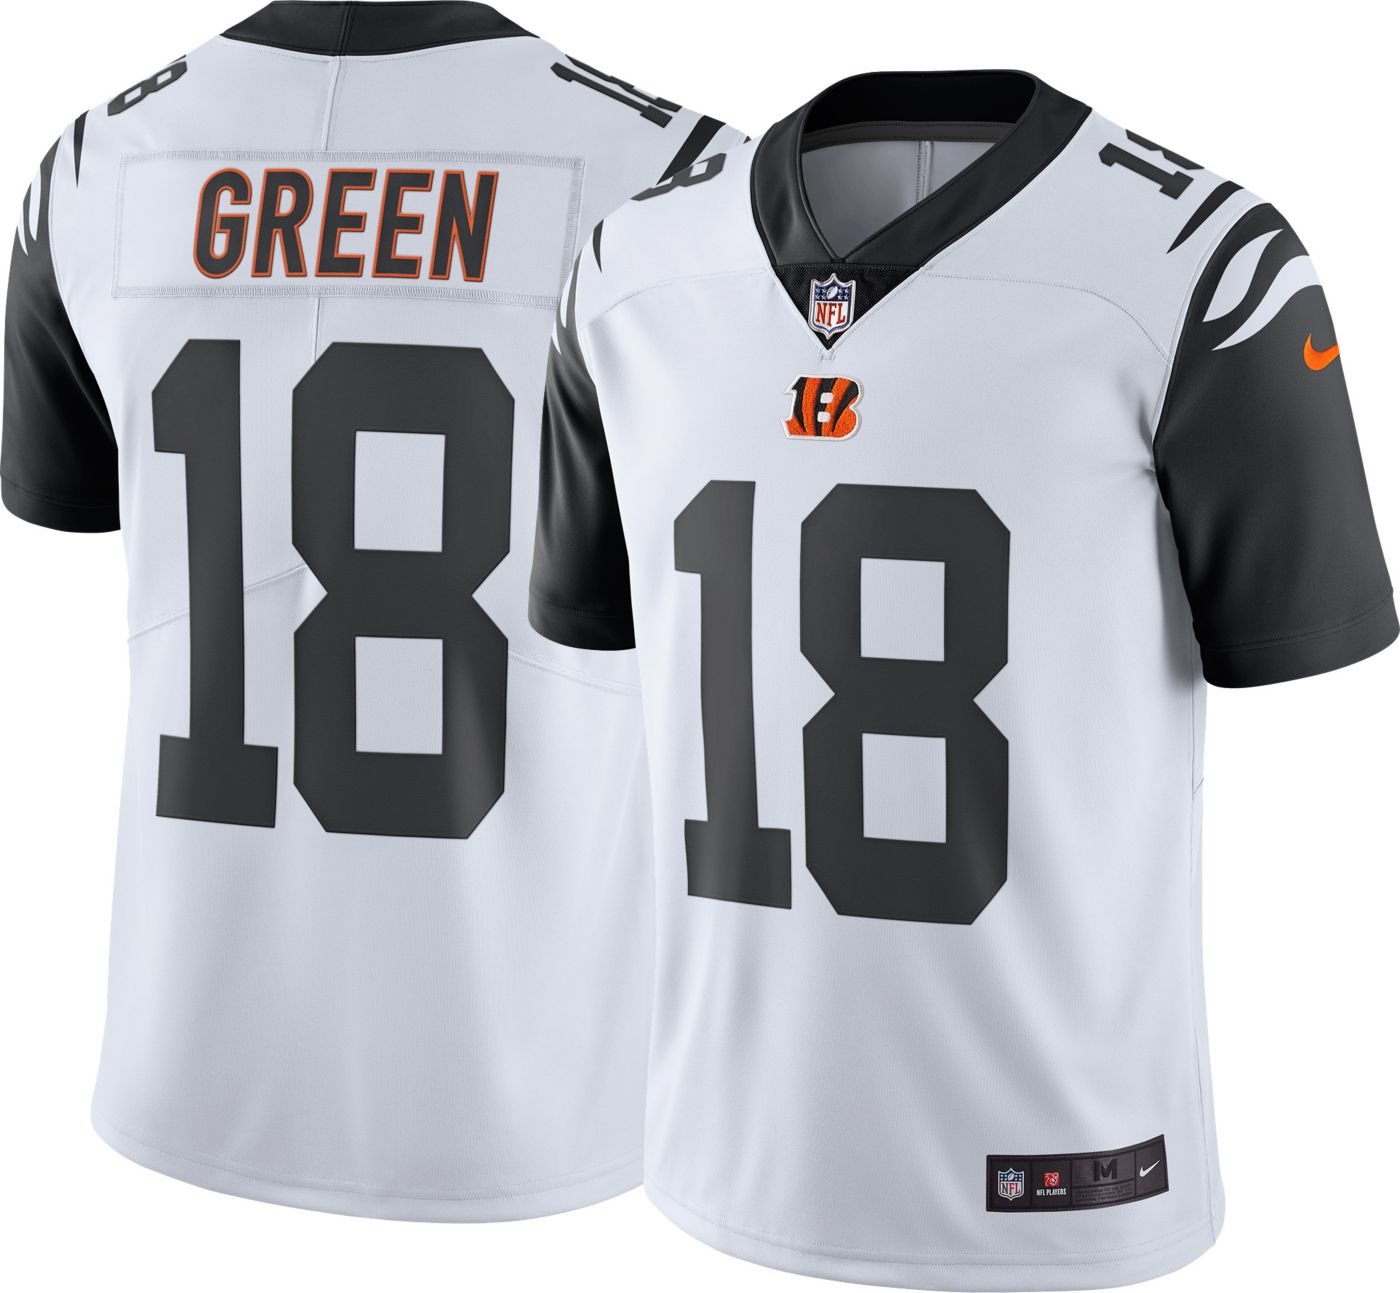 Nike Men's Color Rush Limited Jersey Cincinnati Bengals A.J. Green #18